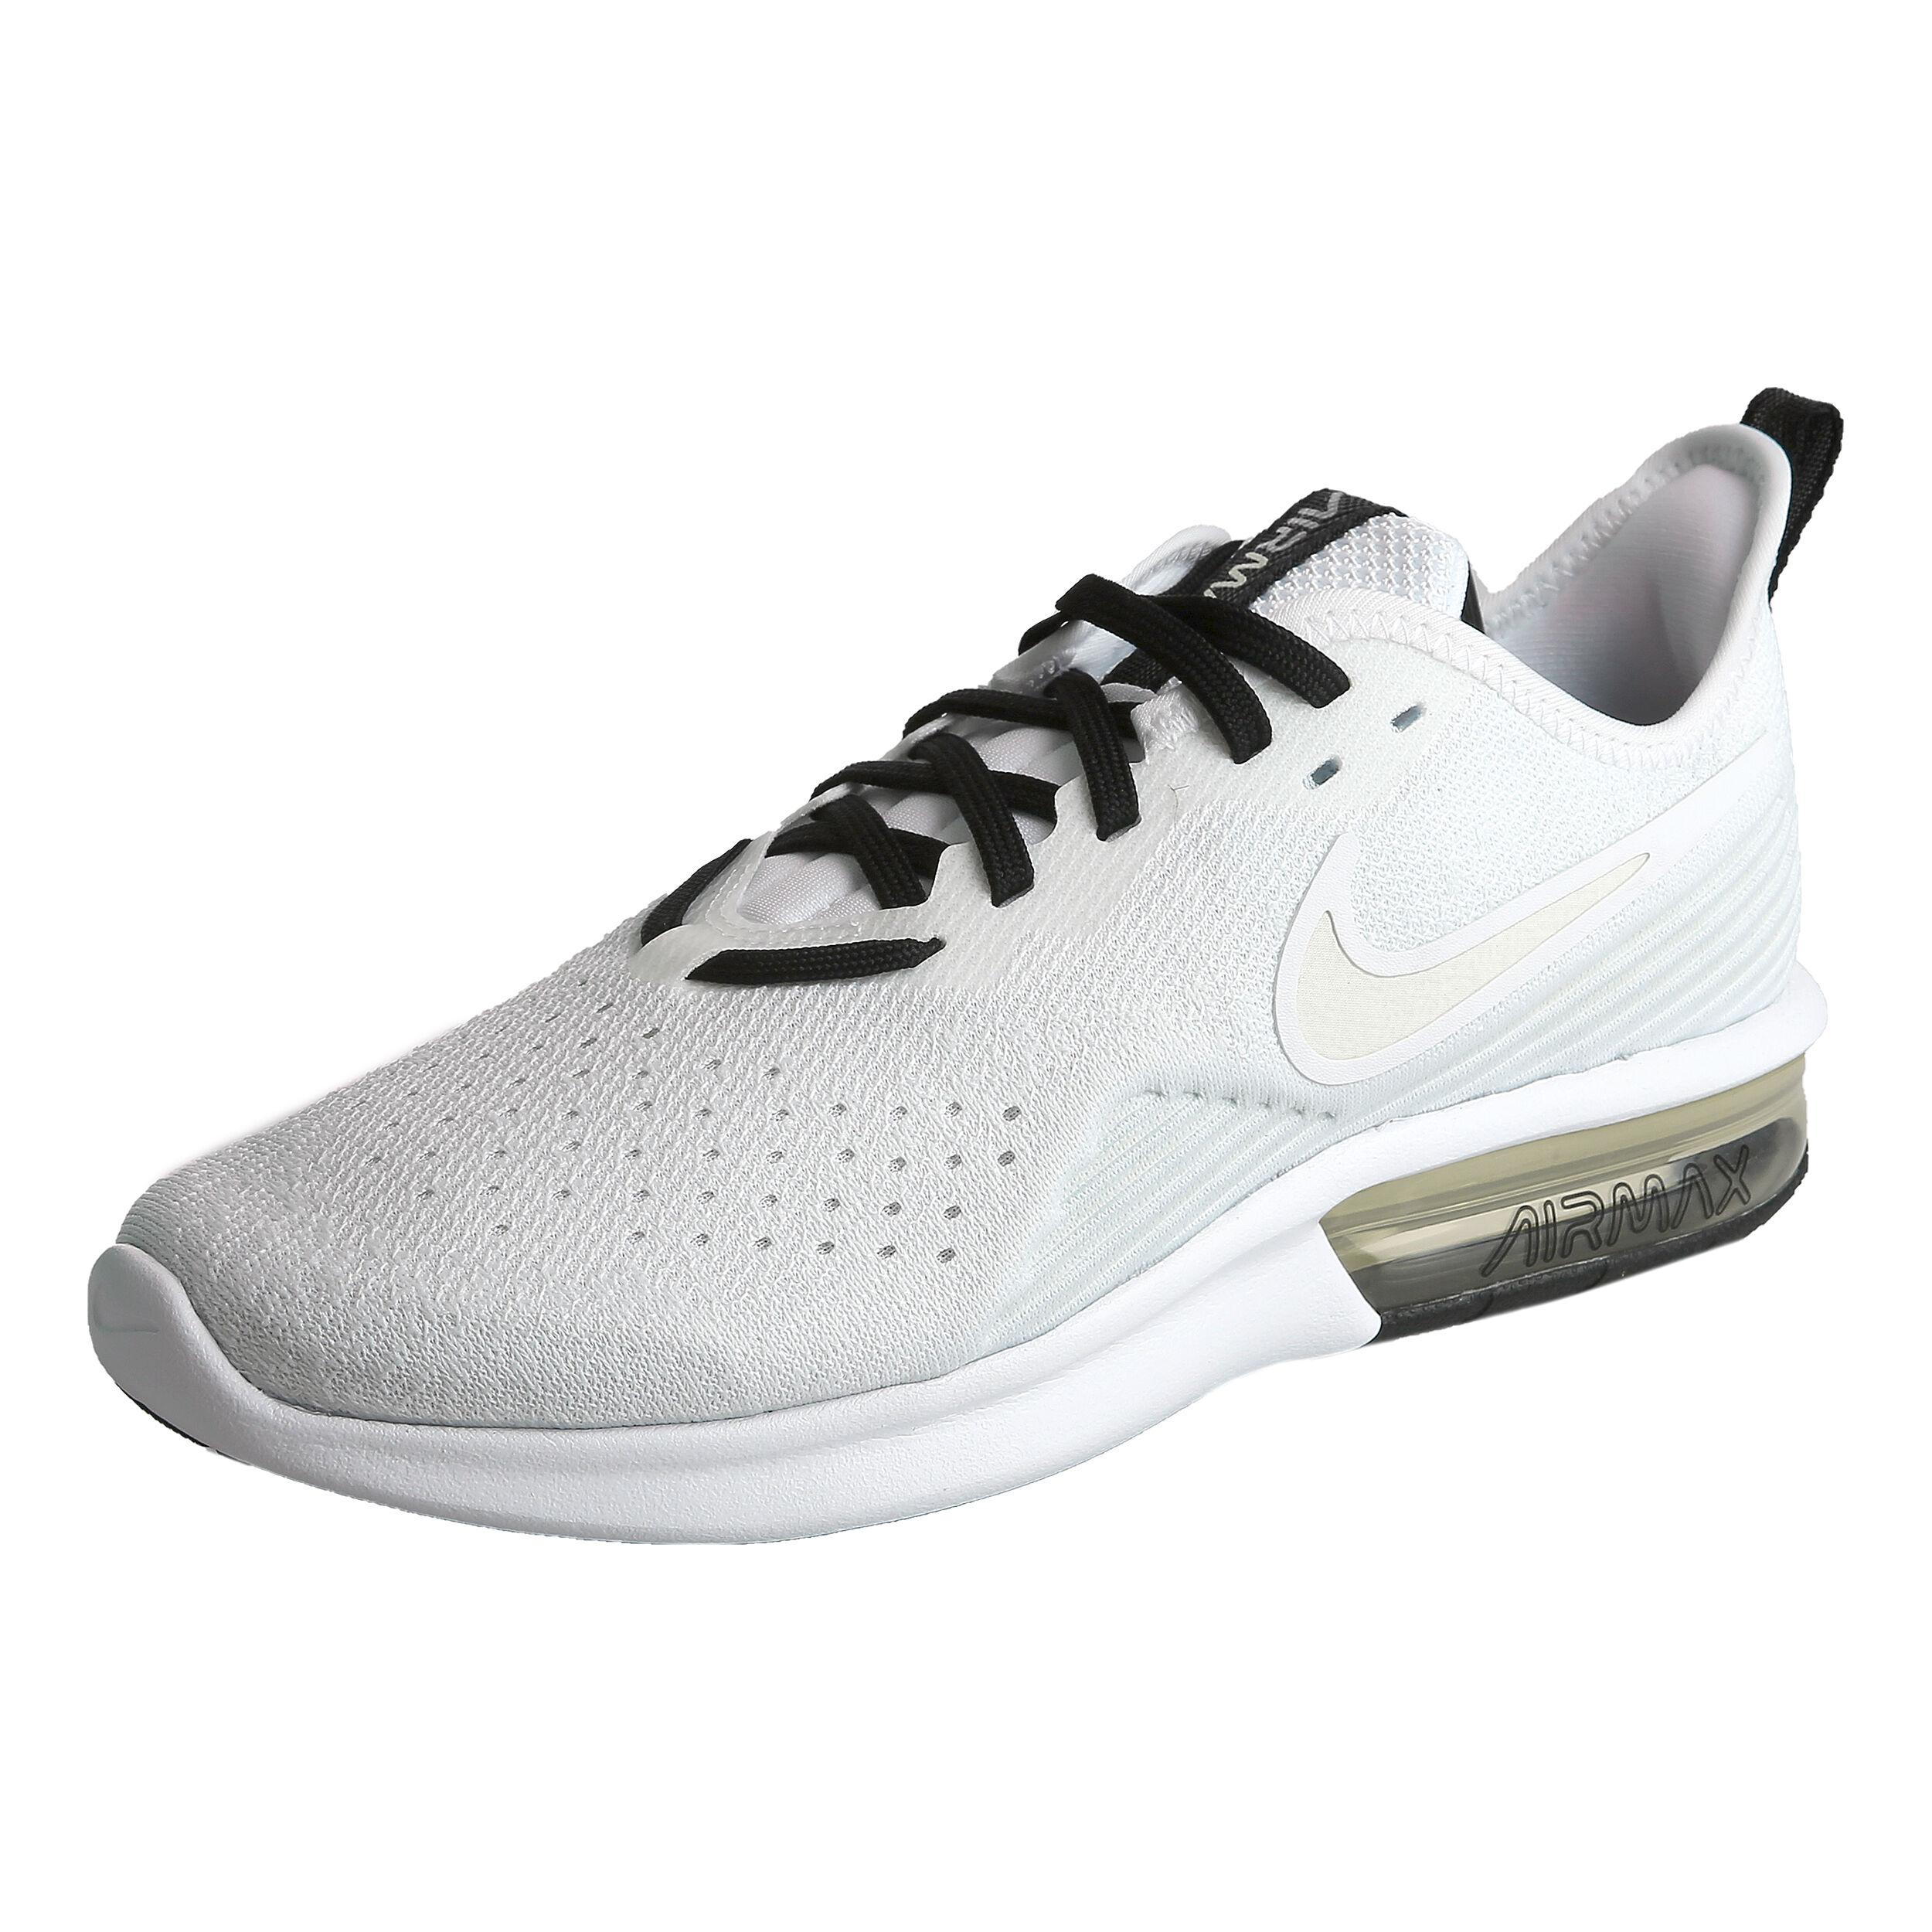 Kosteneffizient Nike Air Max 90 Ultra 2.0 Flyknit 875943 300